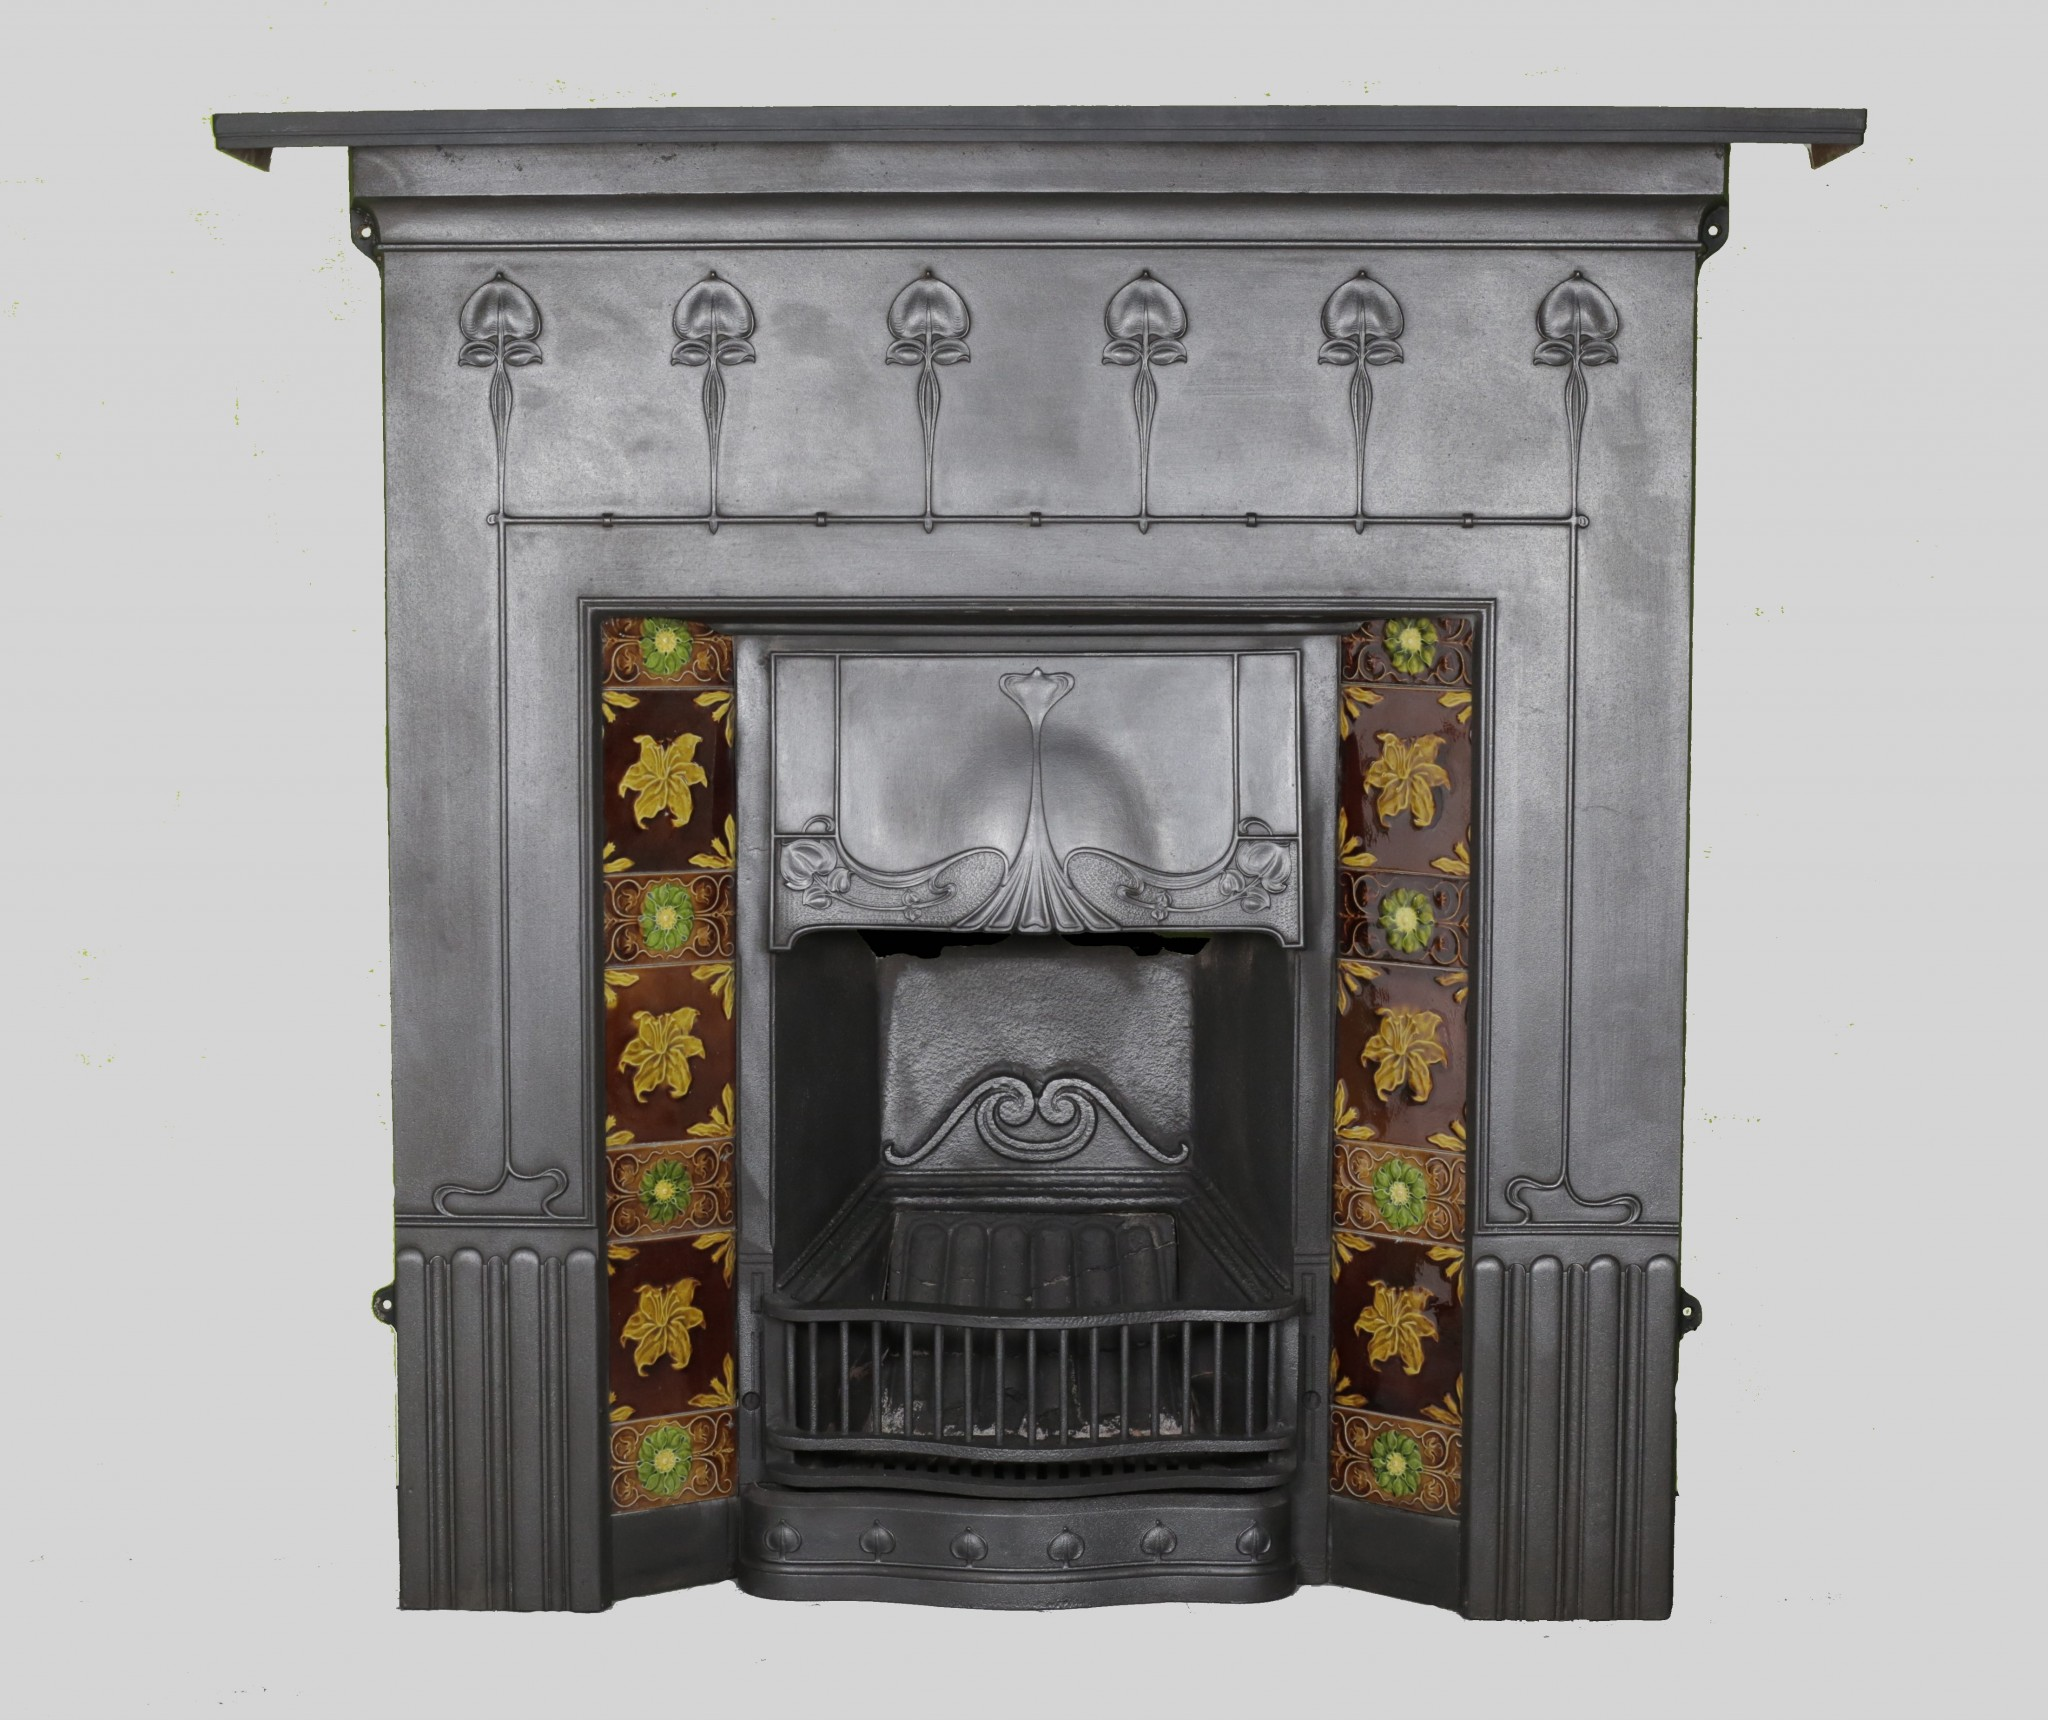 restoration artistic onyx tiles fireplace new installation mantel marble mantels restored antique